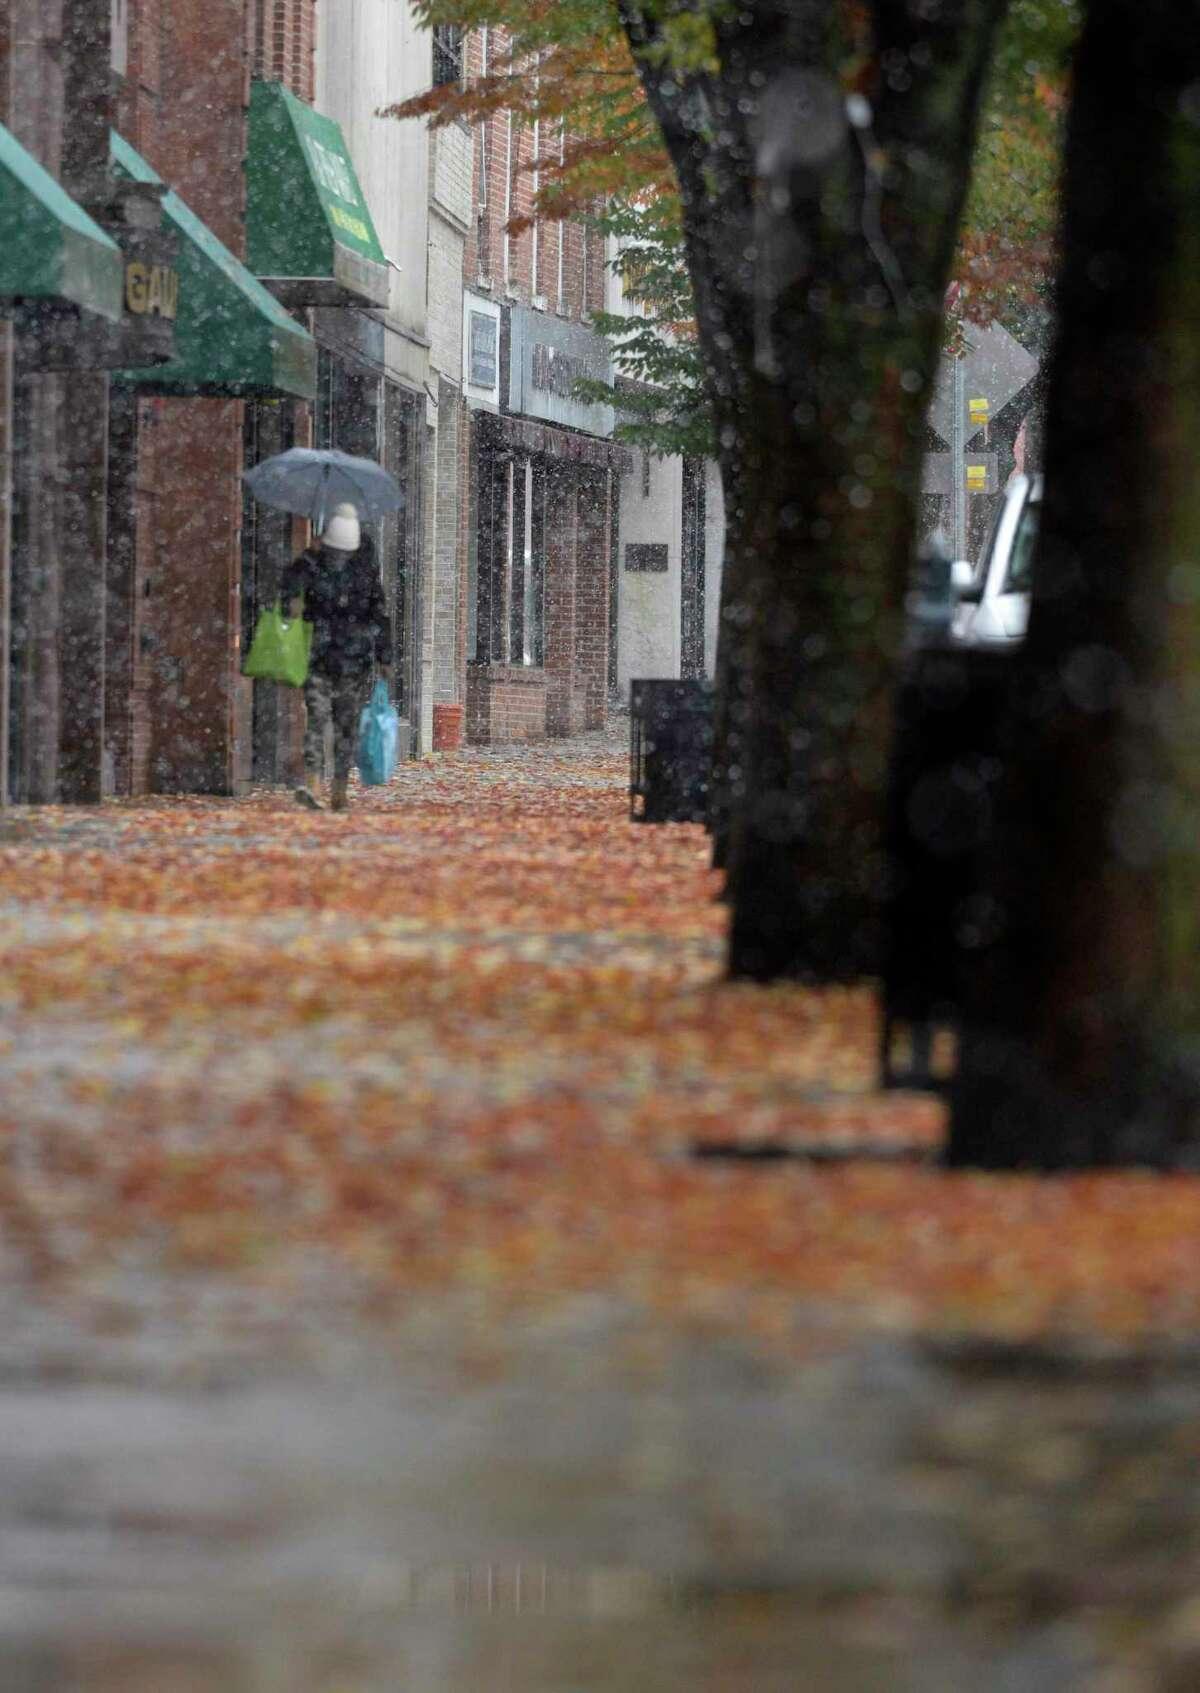 A shopper walks along Main Street on October 30, 2020, Danbury, Conn.